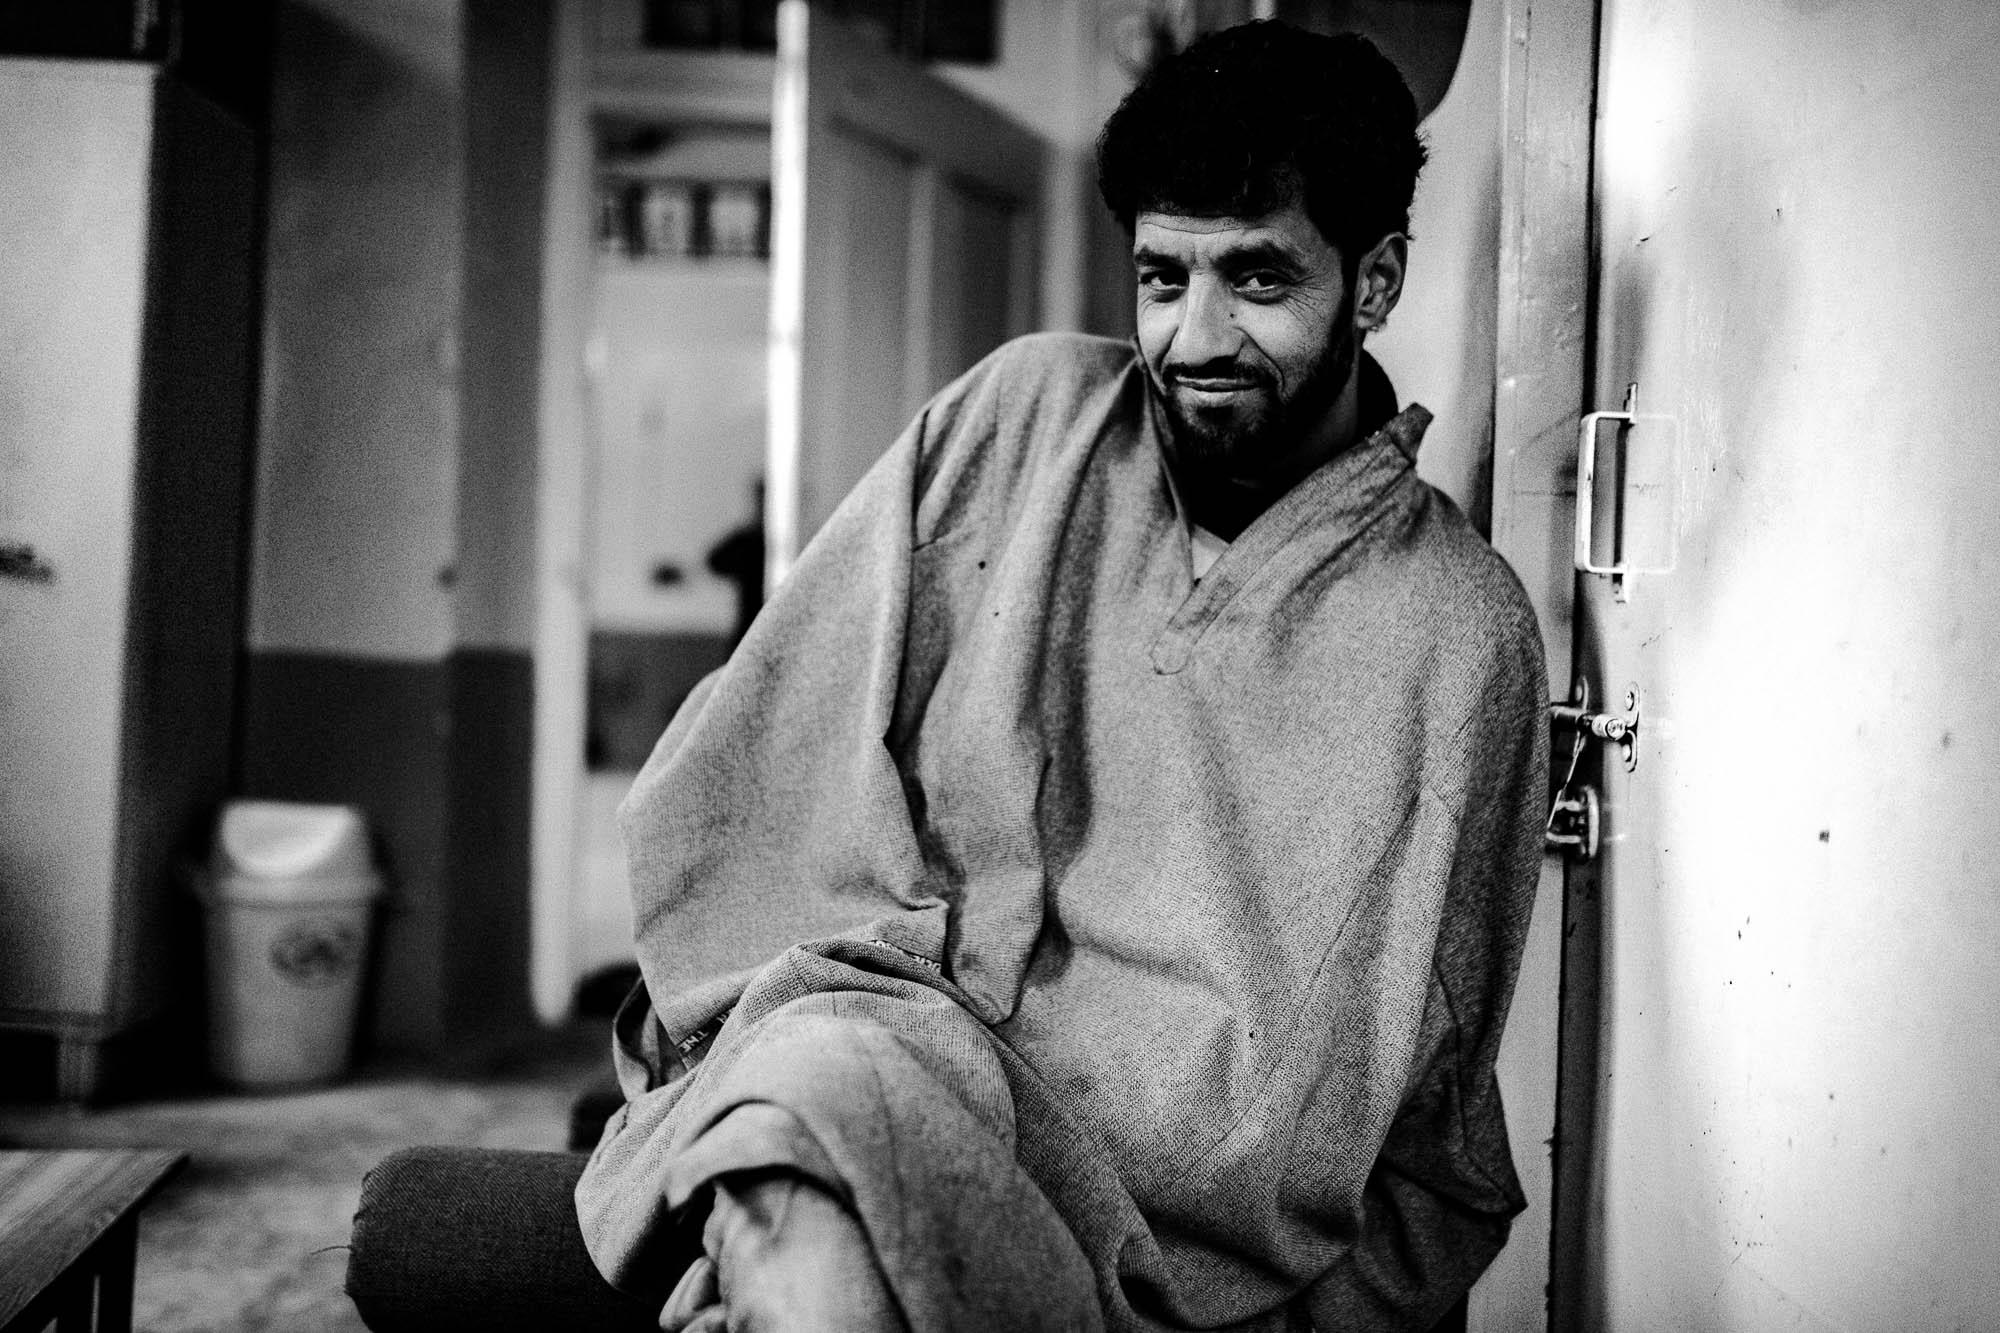 Contemporary ordinary Kashmiris